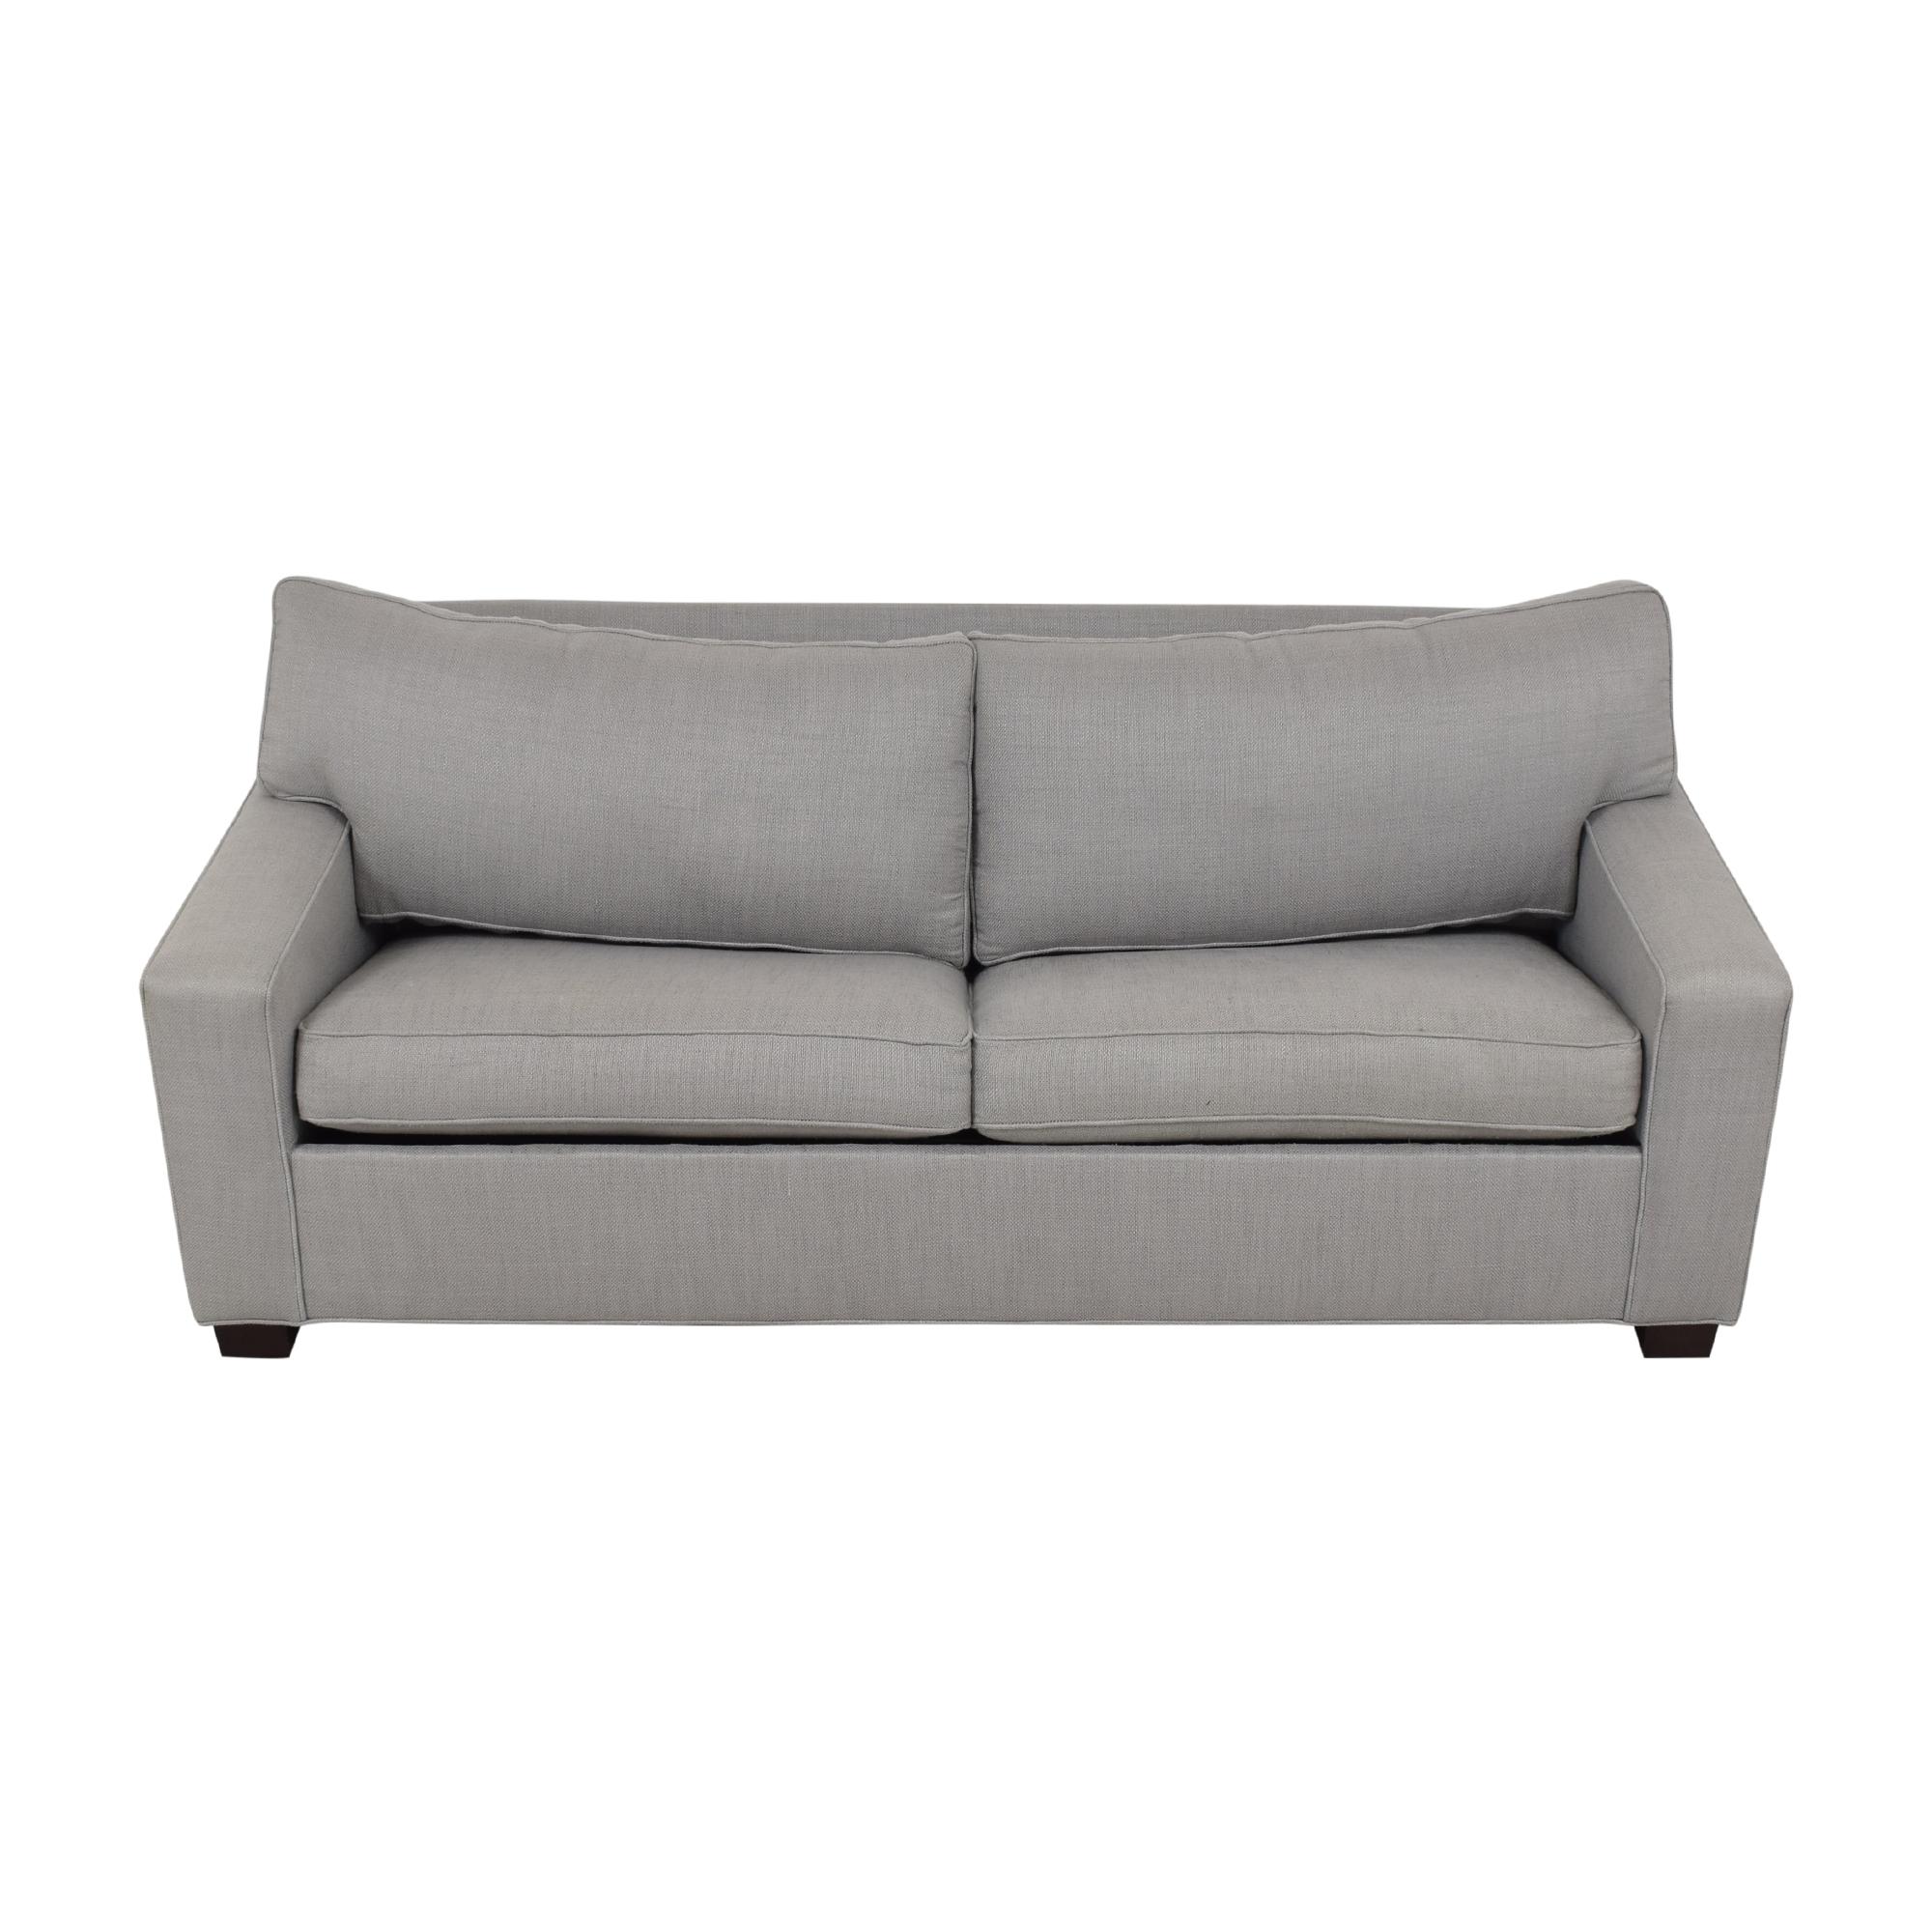 Mitchell Gold + Bob Williams Mitchell Gold + Bob Williams Queen Sleeper Sofa Sofas